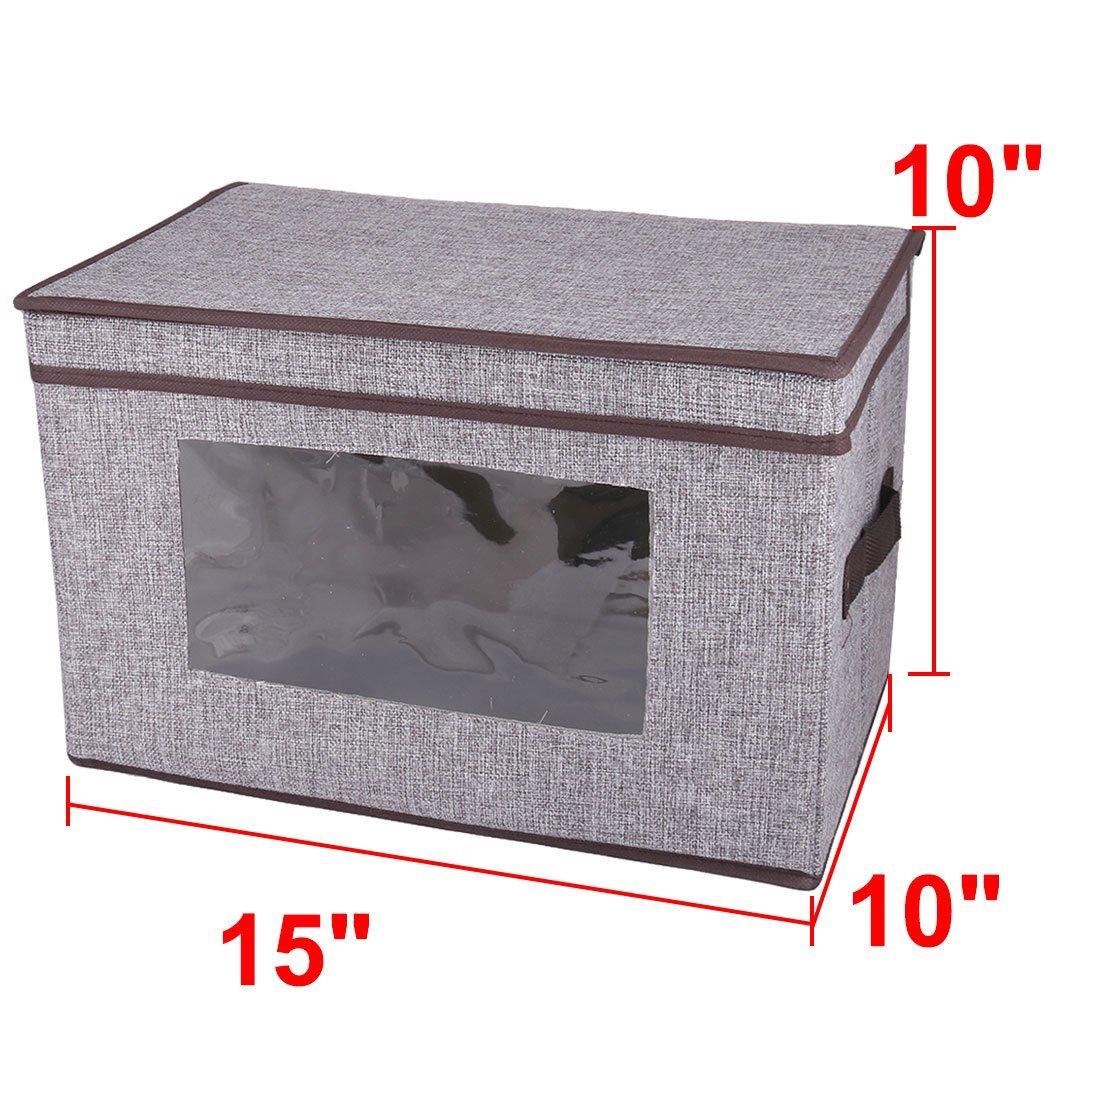 Amazon.com : eDealMax ropa Para el hogar Ropa plegable del edredón caso Titular caja de almacenamiento DE 38 x 25 x 25 cm Gris : Office Products